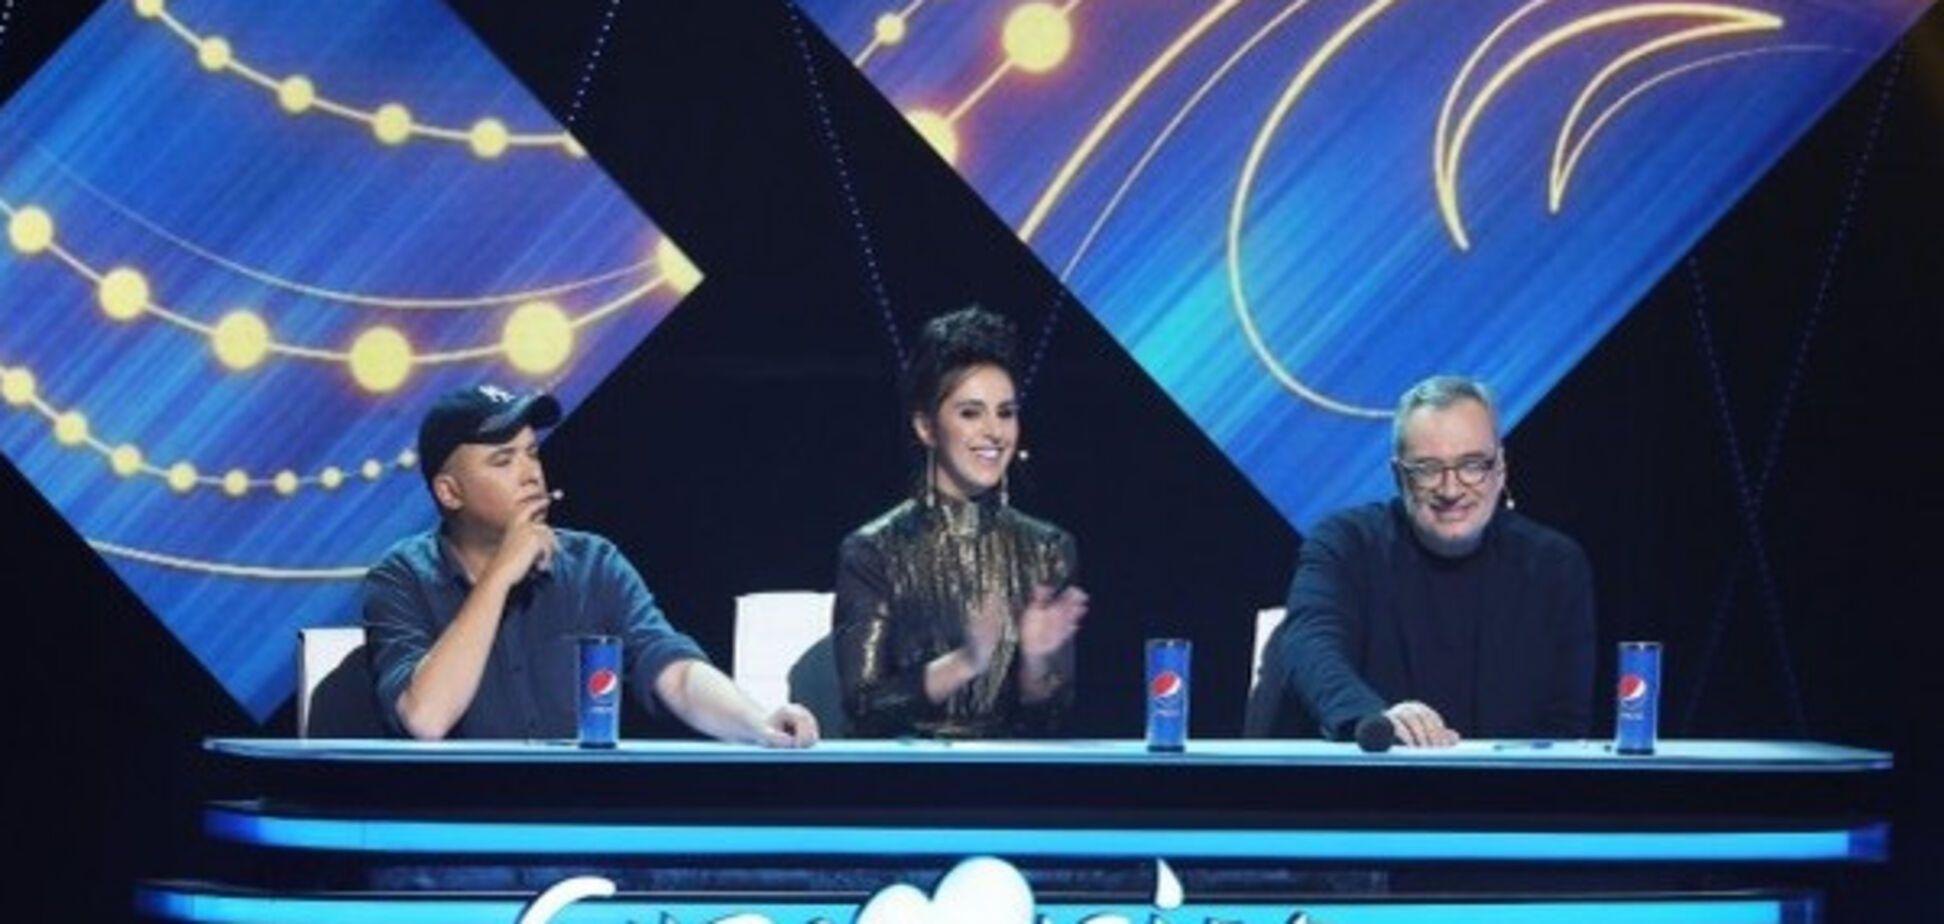 Андрей Данилко, Джамала, Константин Меладзе